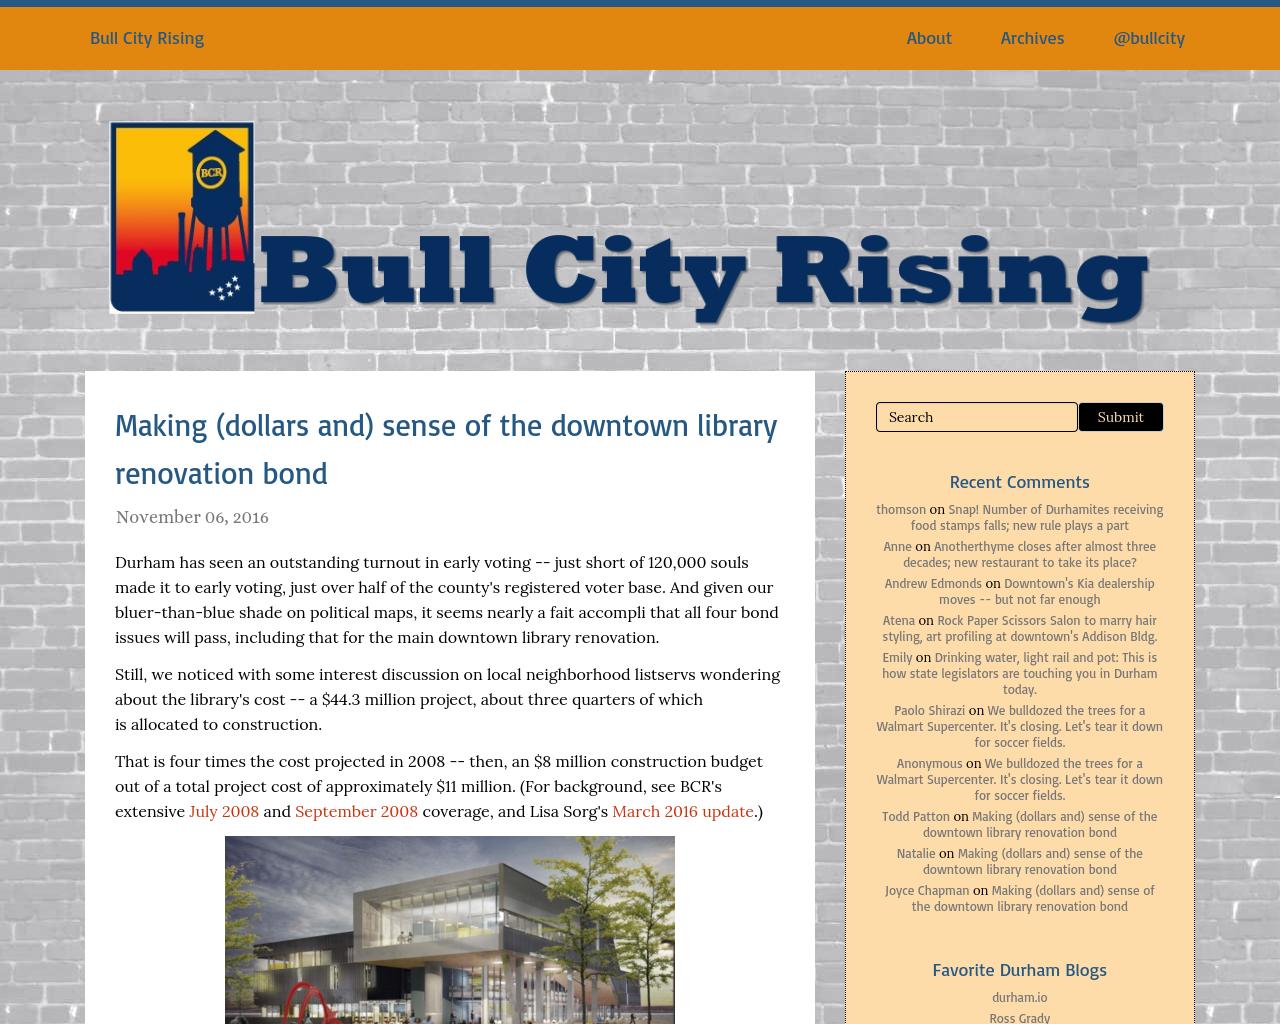 Bull-City-Rising-Advertising-Reviews-Pricing